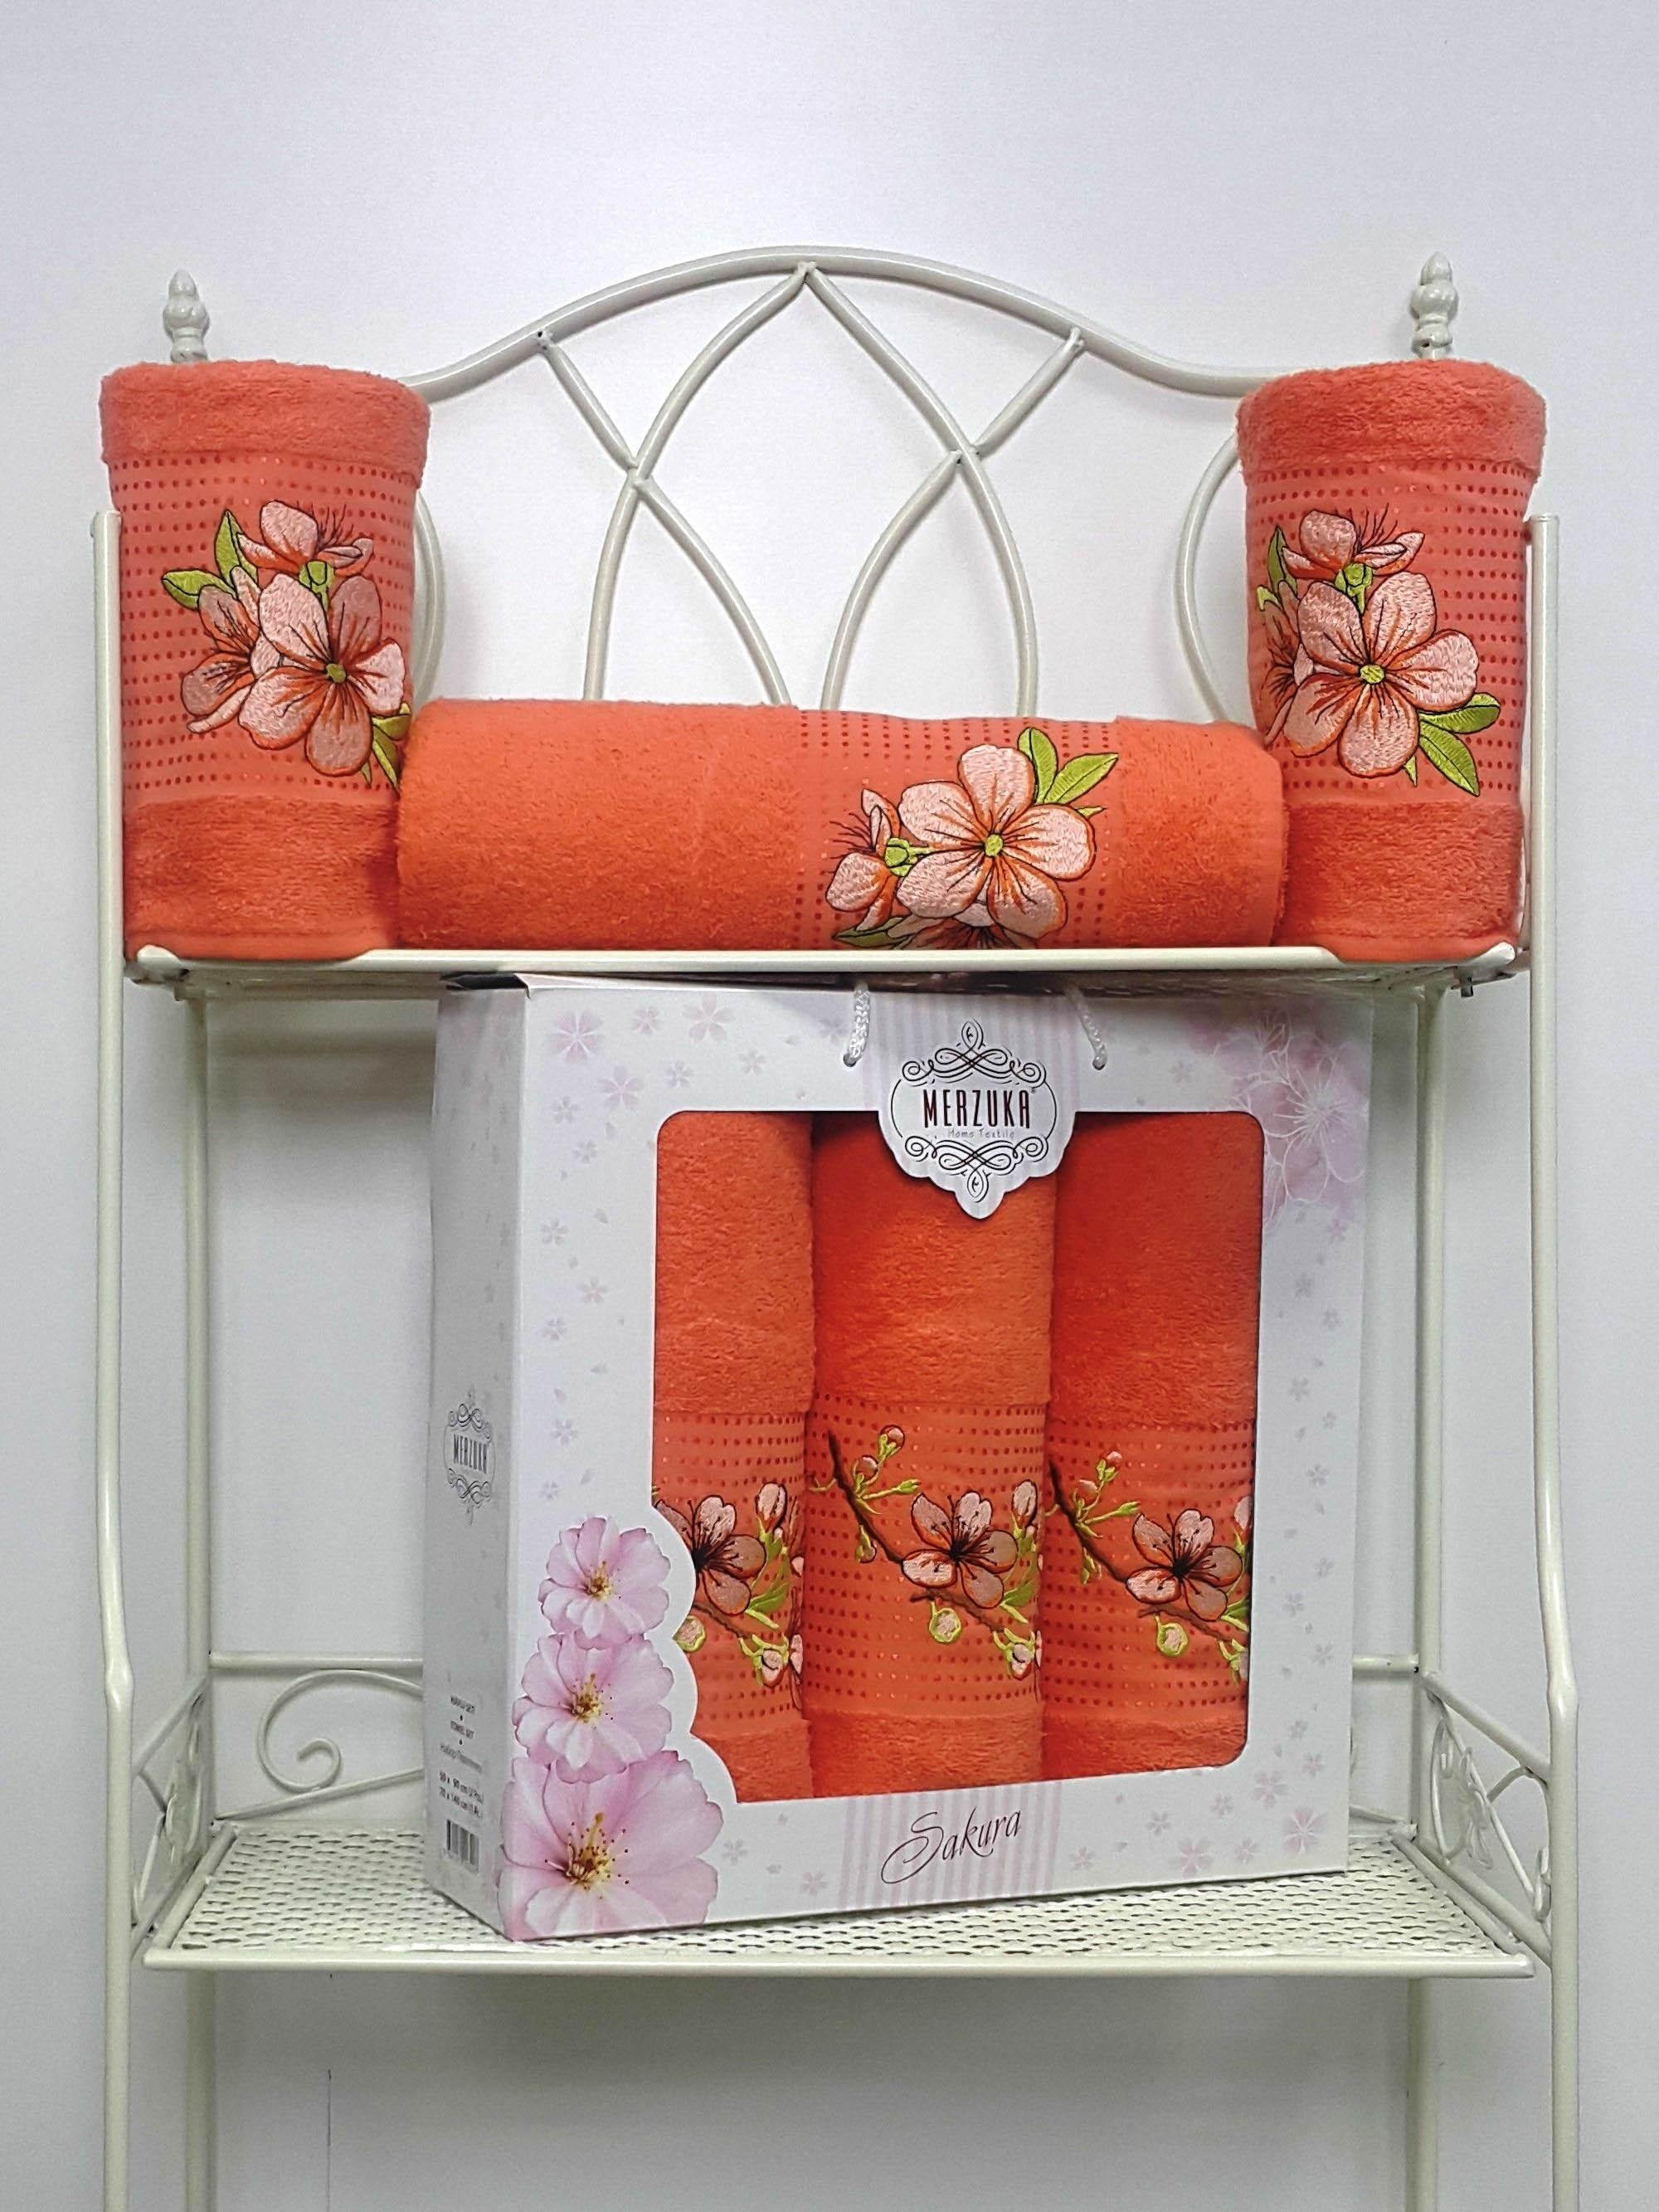 Полотенца Oran Merzuka Полотенце Sakura Цвет: Оранжевый (Набор) набор из 3 полотенец merzuka sakura 50х90 2 70х140 8432 розовый